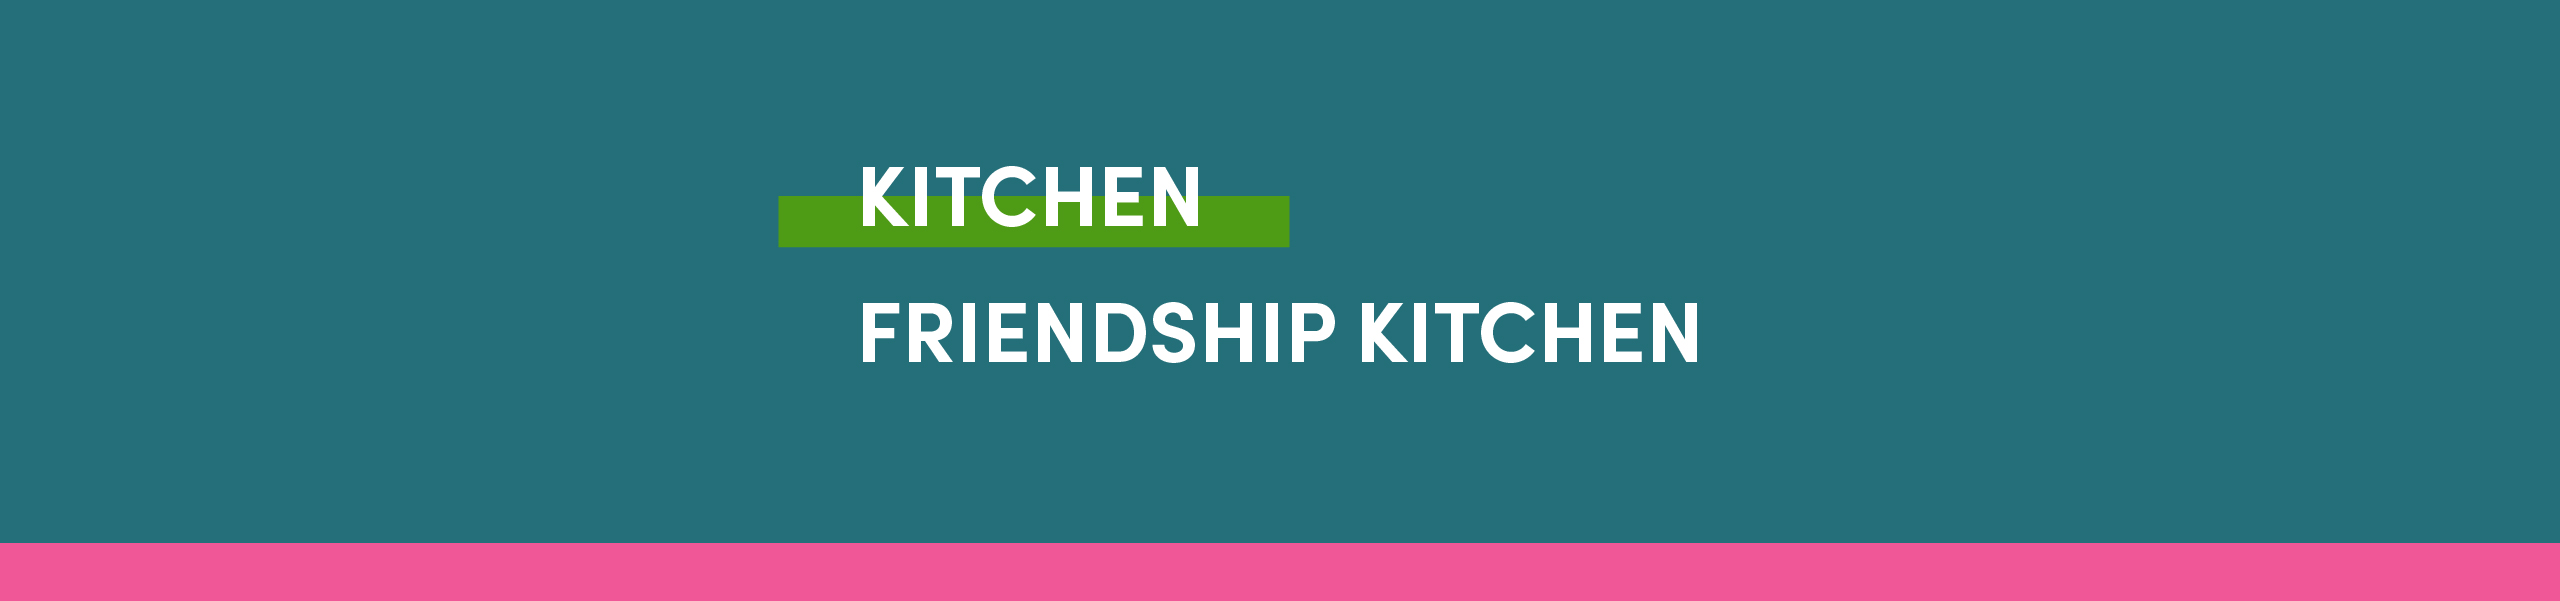 TAIWANfest Letterhead - Friendship Kitchen